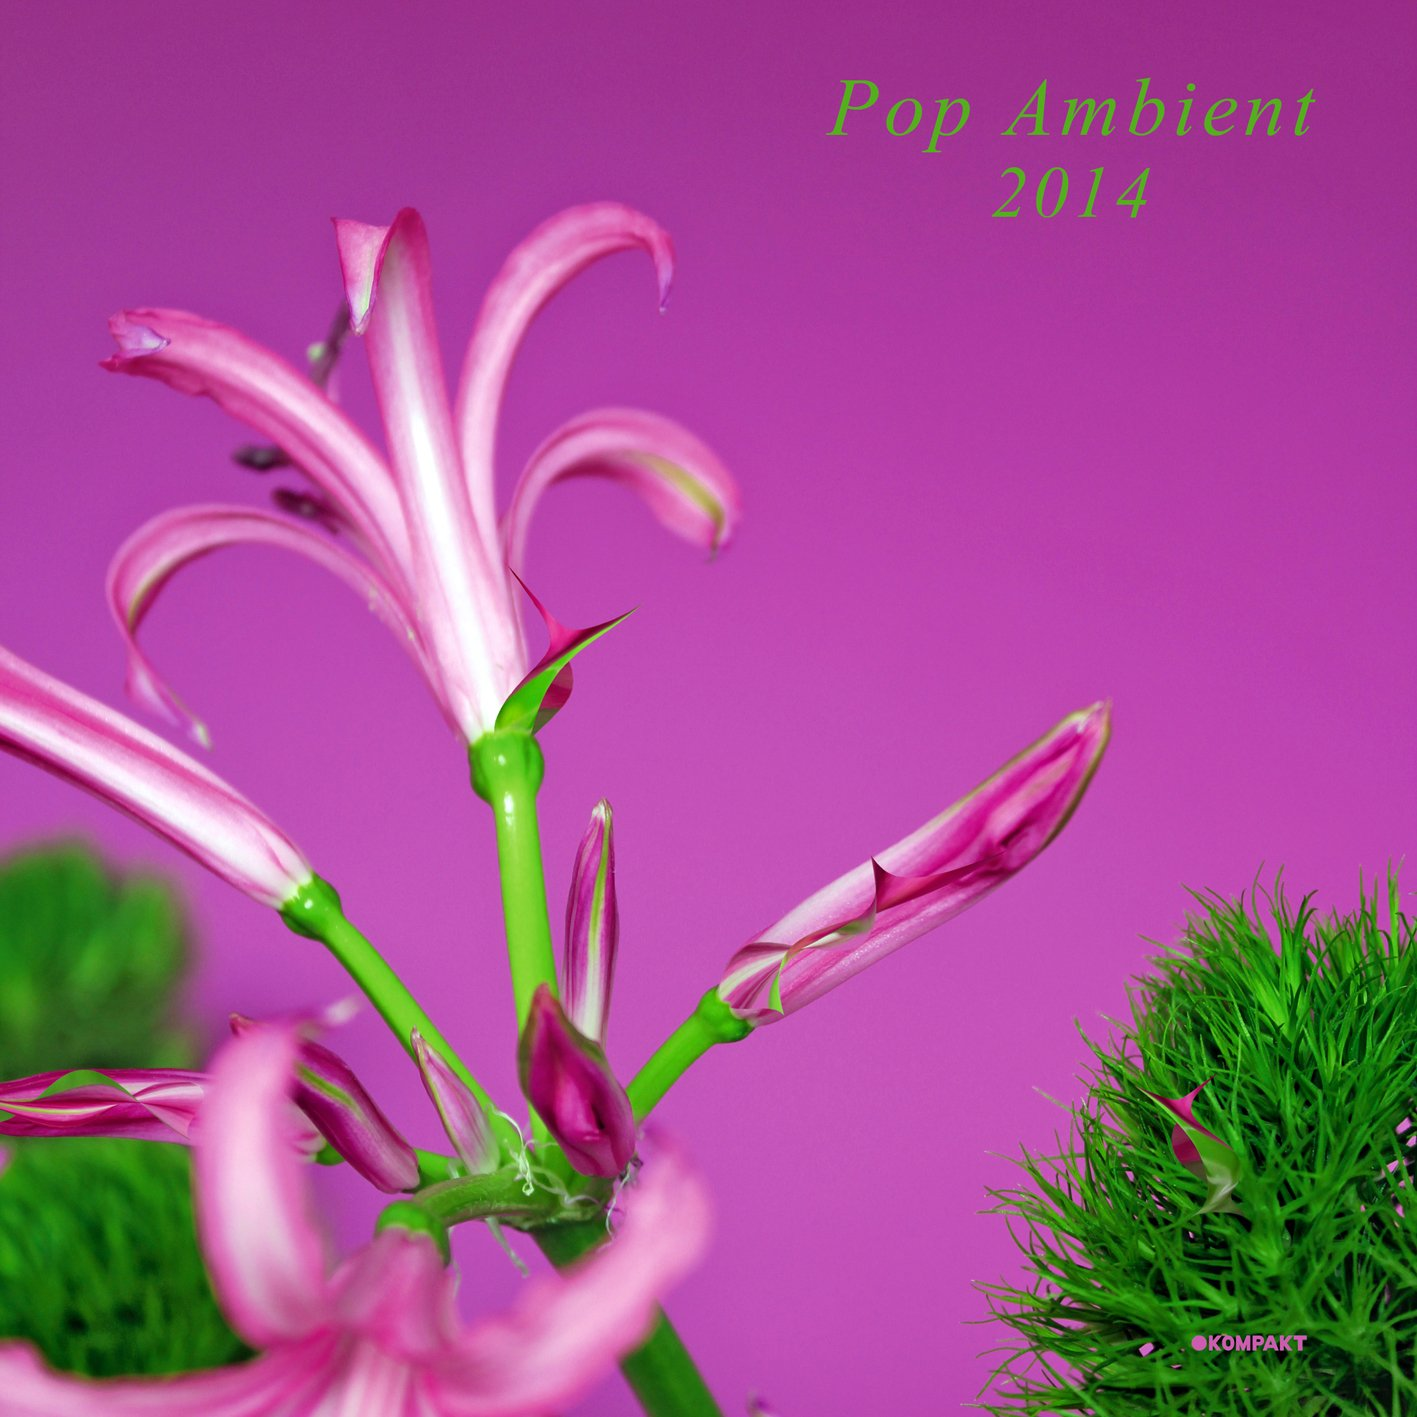 CD : VARIOUS ARTISTS - Pop Ambient 2014 /  Various (CD)